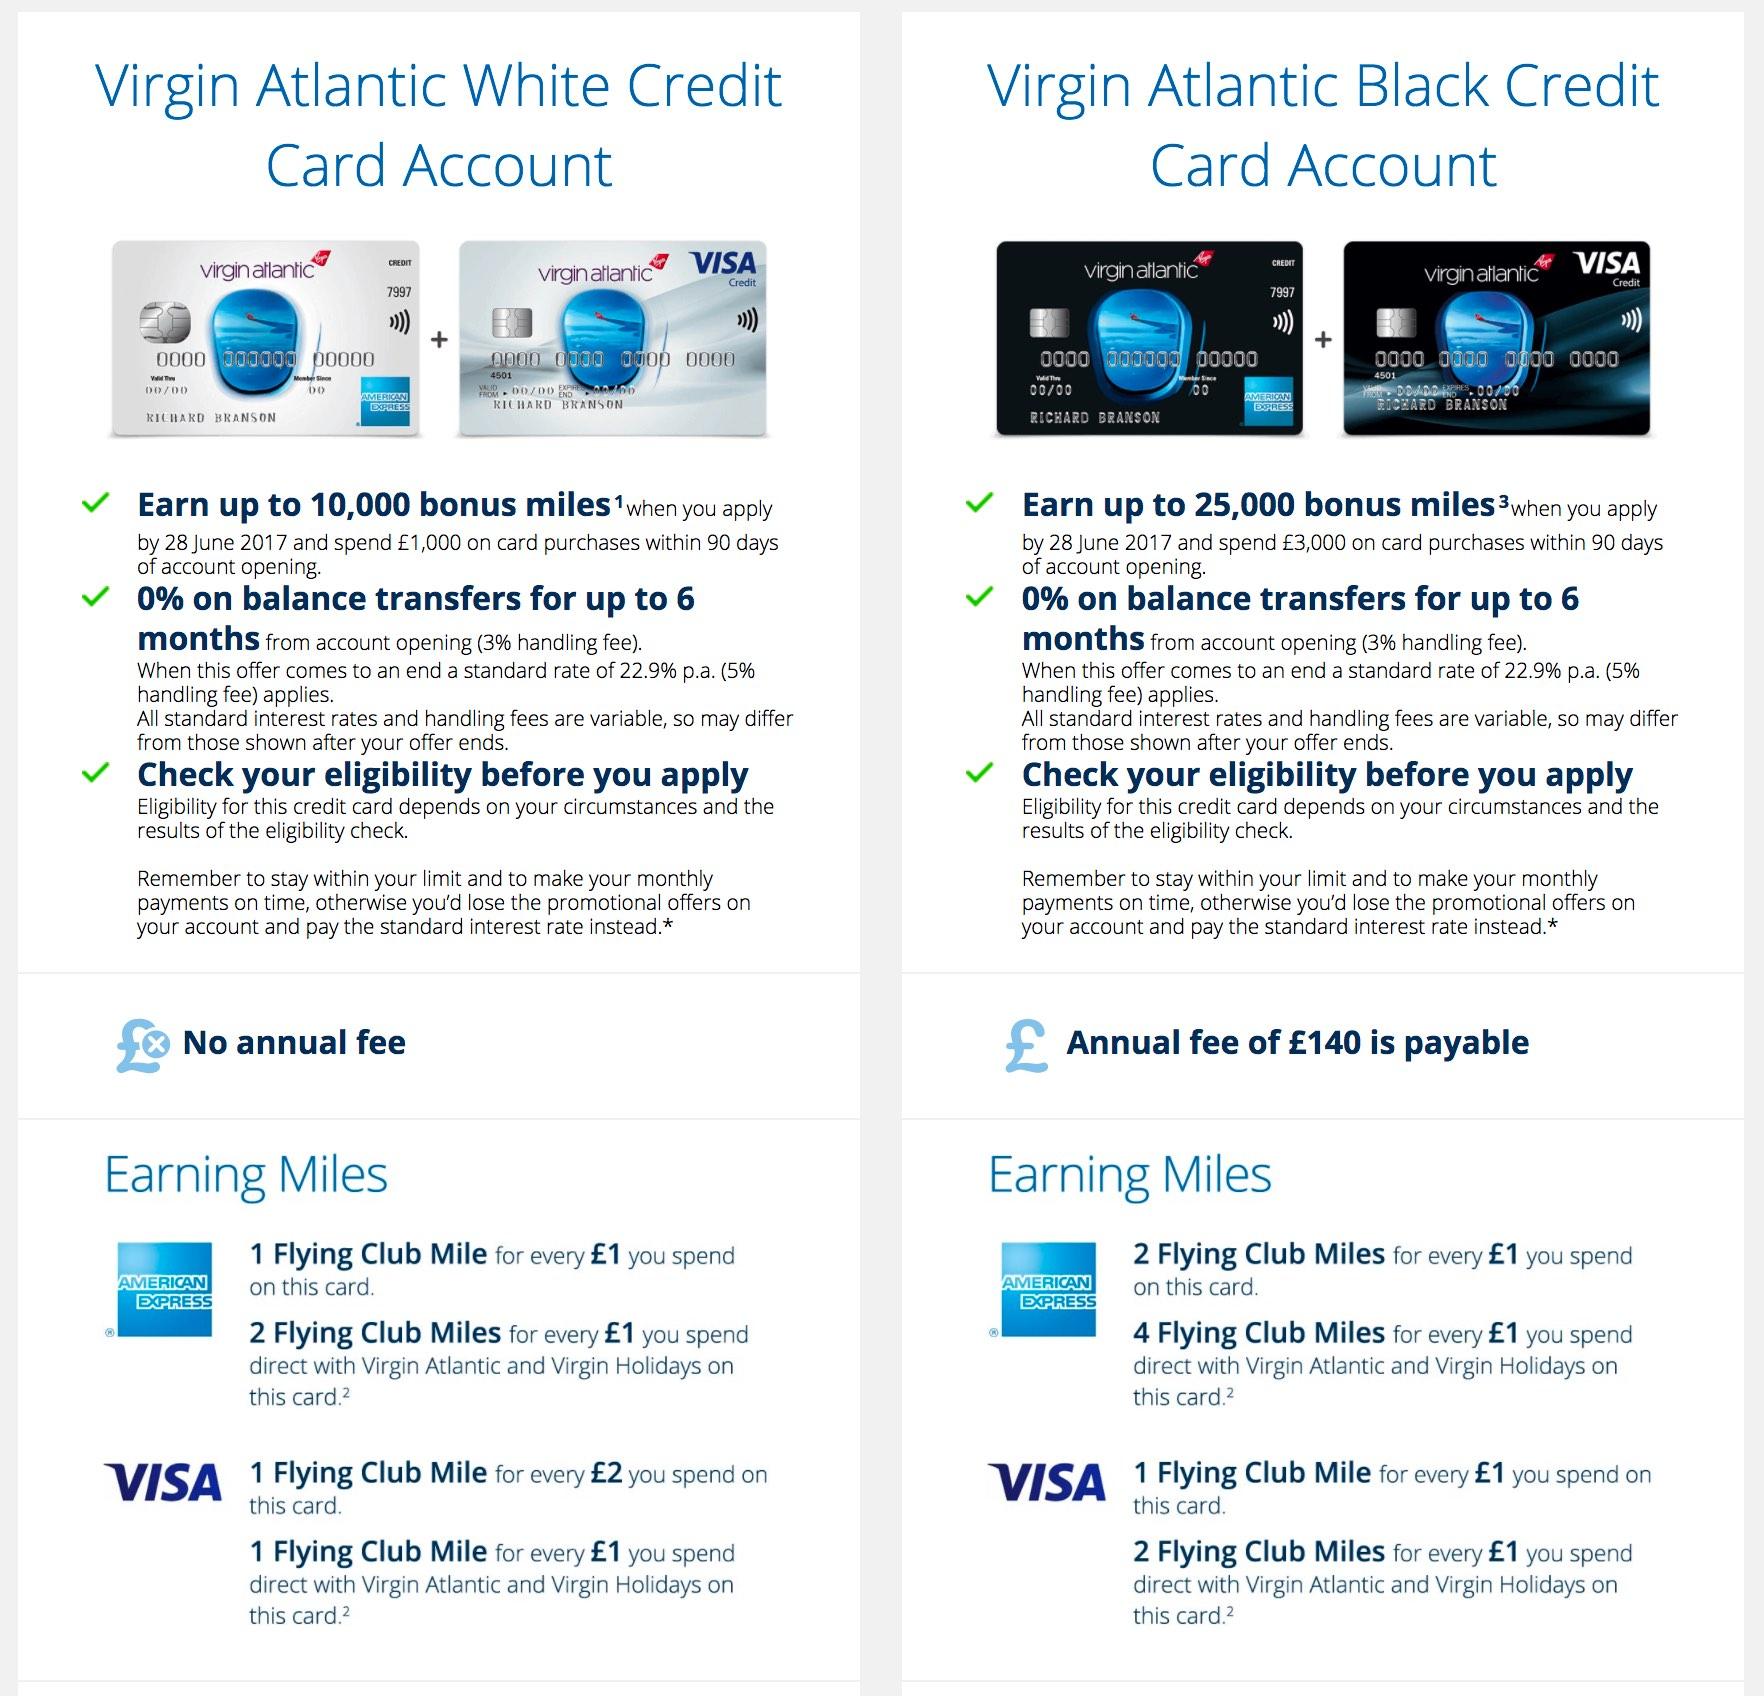 How to get FREE Virgin Atlantic Air Miles